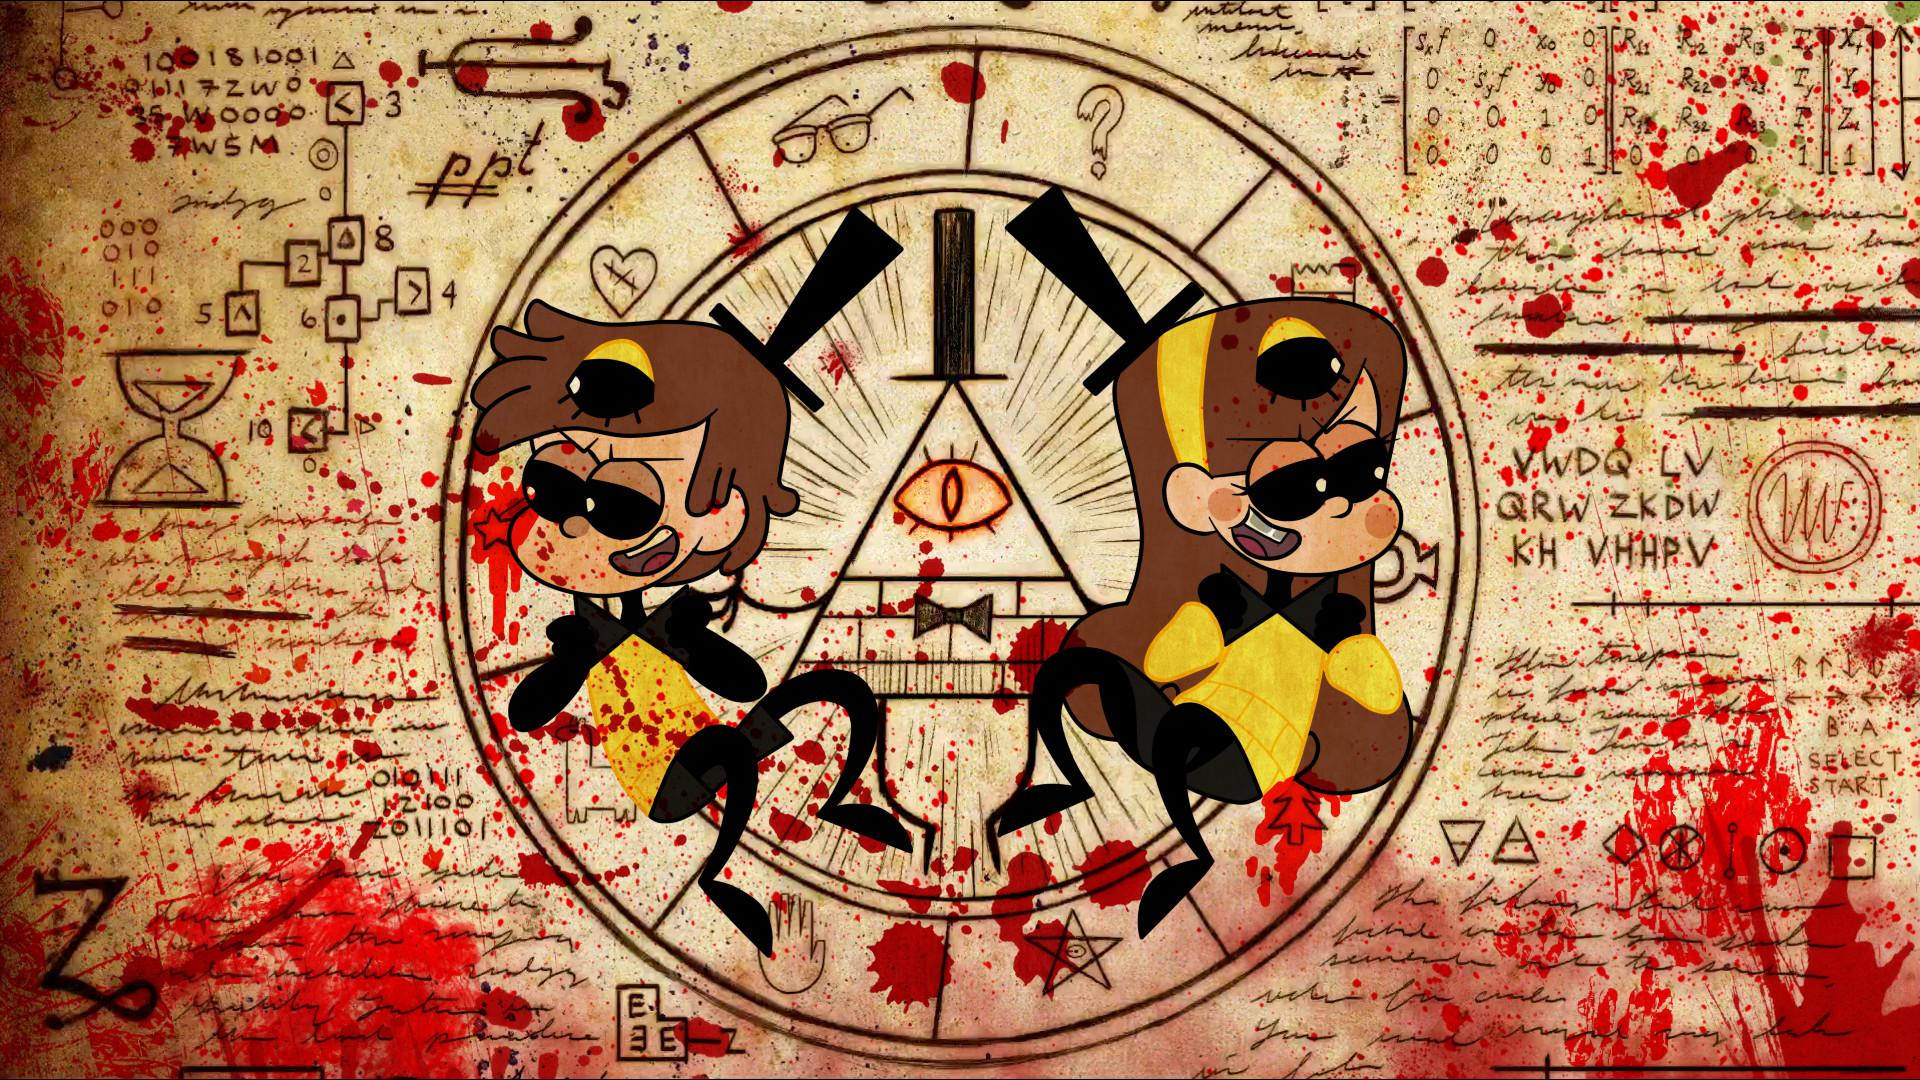 Pin by Aliyah Chung on Gravity Falls   Pinterest   Art, Twin and deviantART